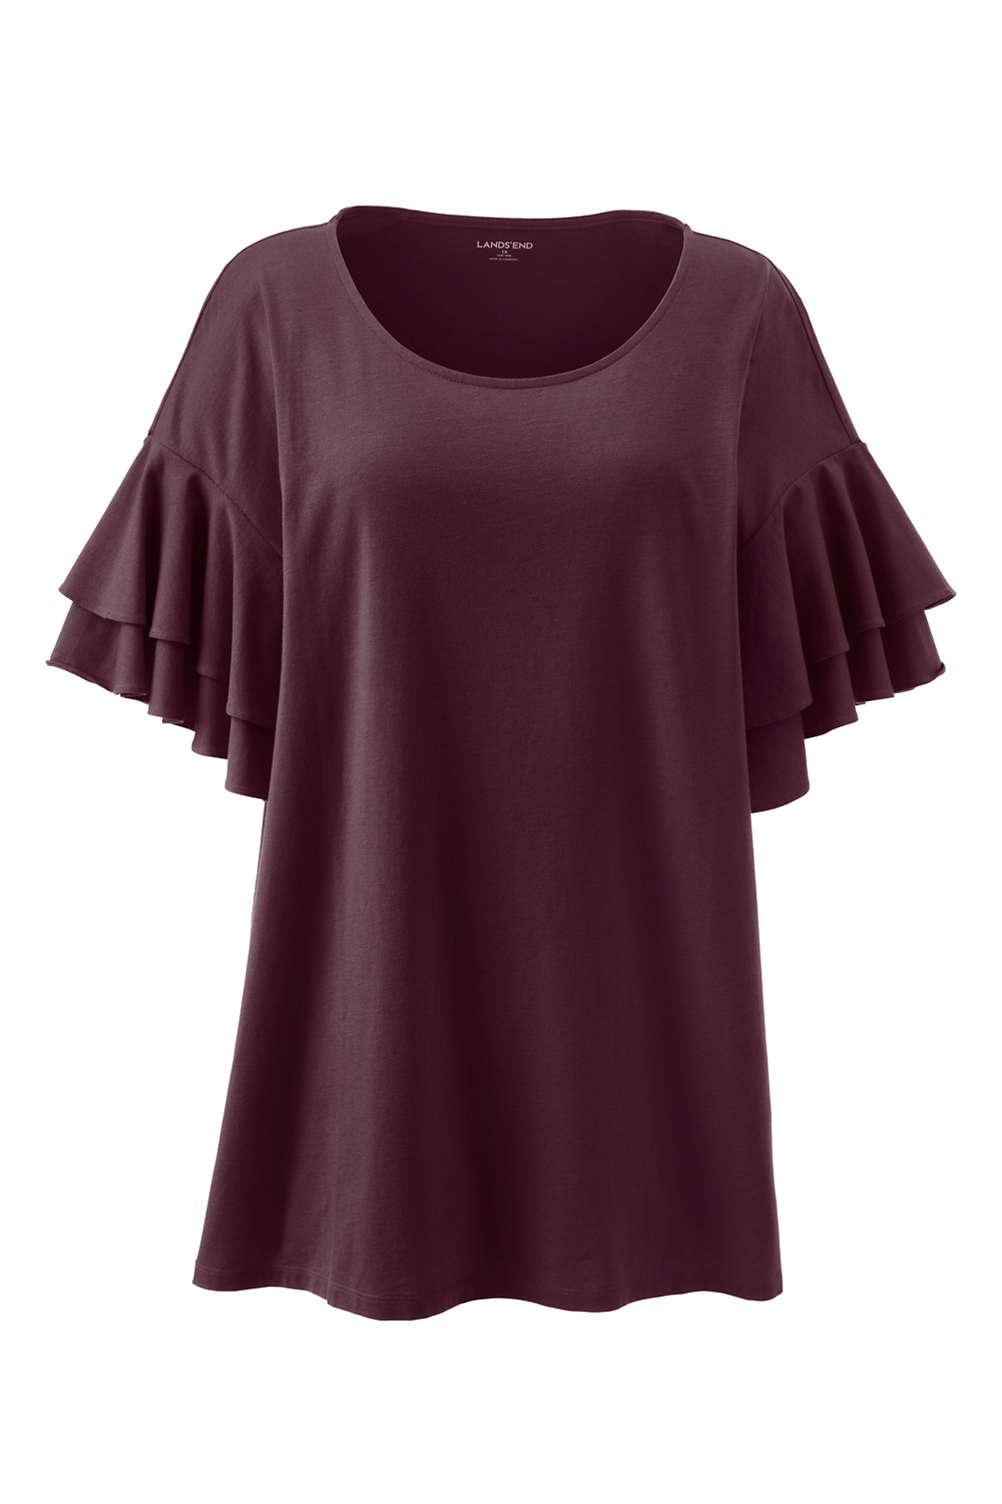 d8fa10558474d Women s Plus Size Stacked Ruffle Sleeve Tunic. Item  4988166Q4. View  Fullscreen